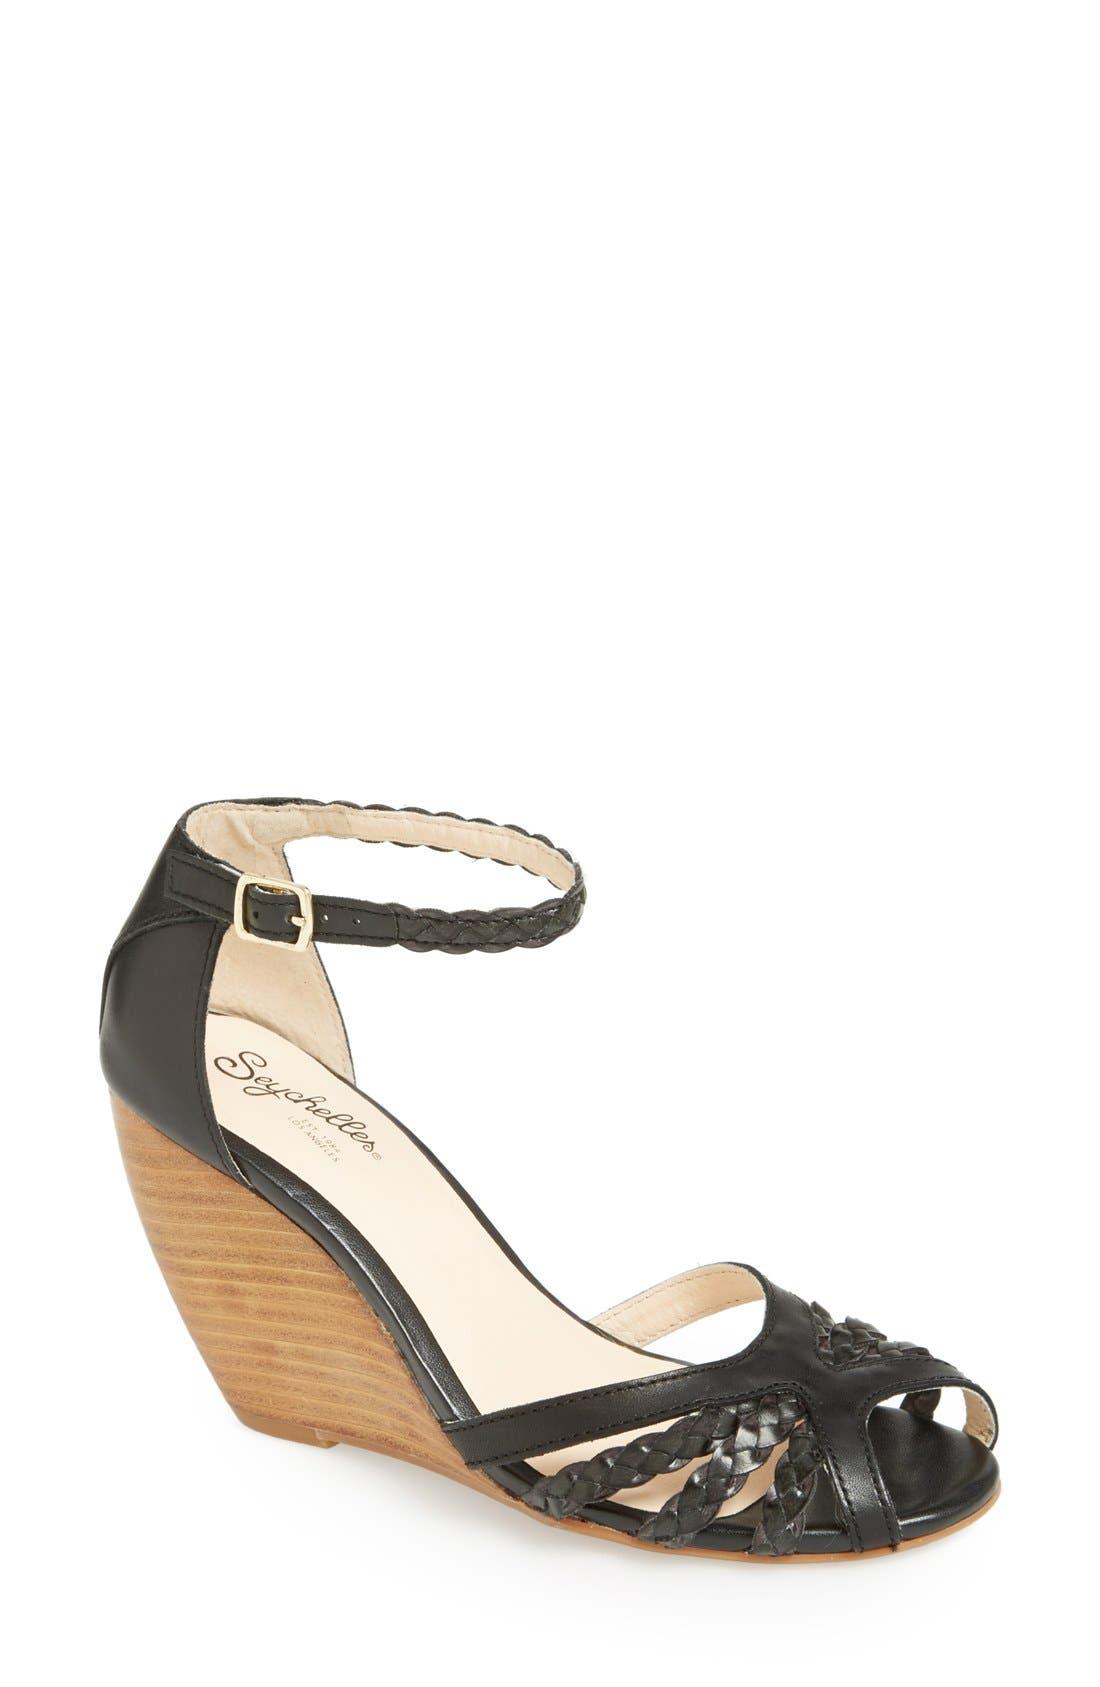 Main Image - Seychelles 'Like a Lady' Wedge Sandal (Women)